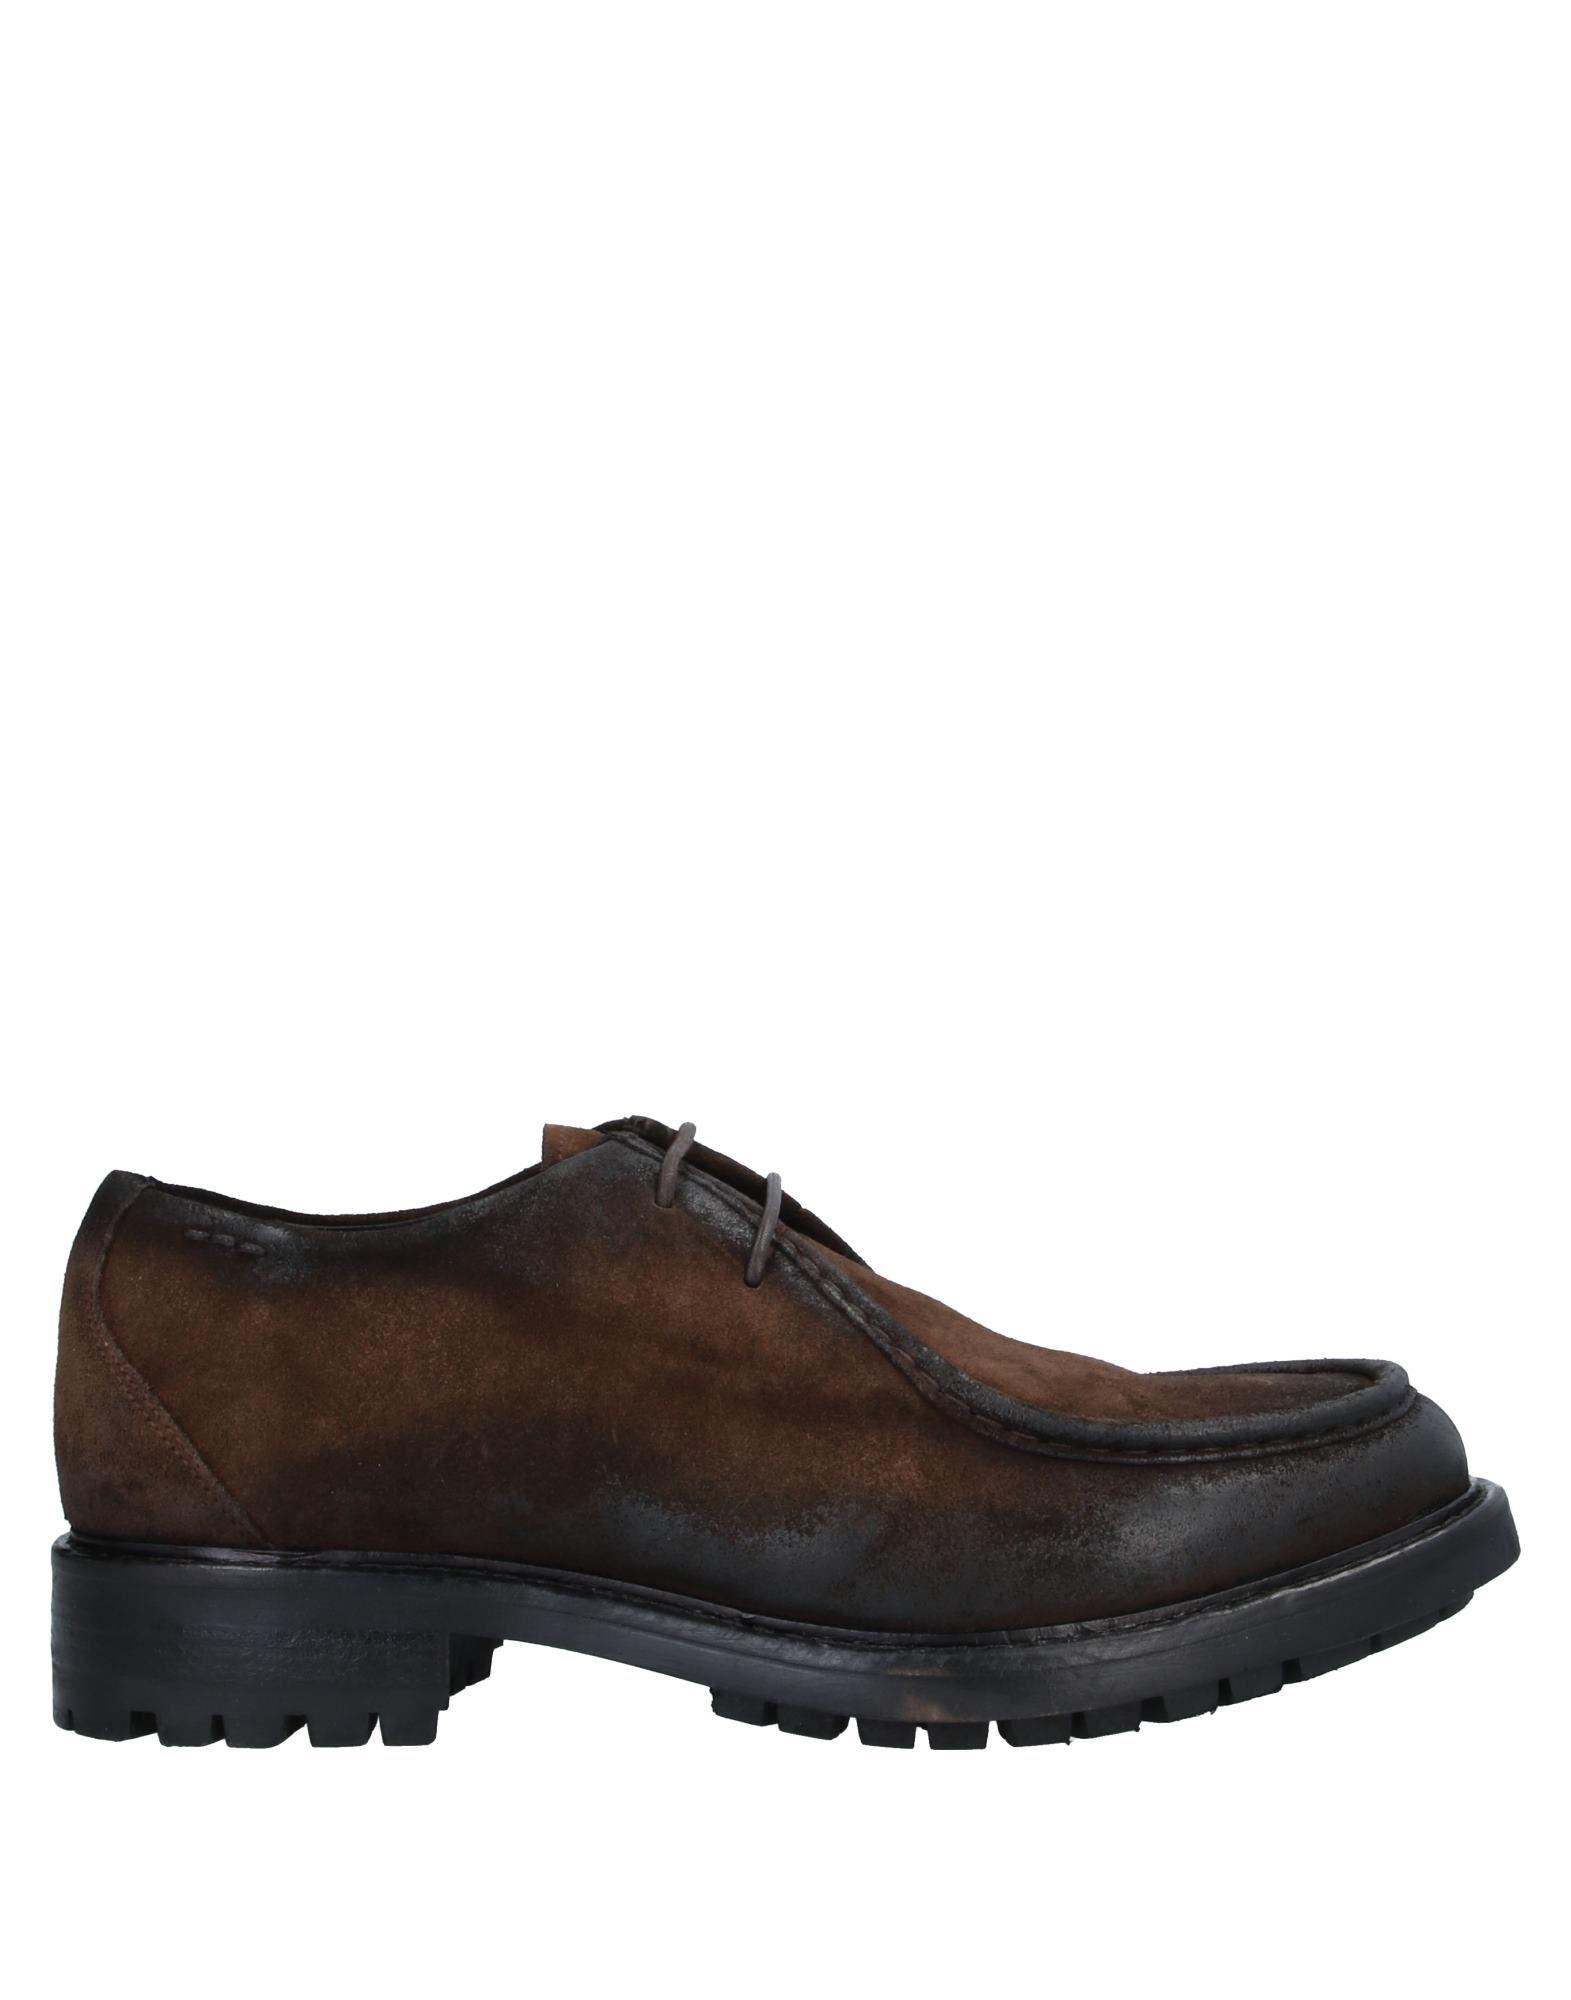 MALAGOLI M. Обувь на шнурках miss m обувь на шнурках